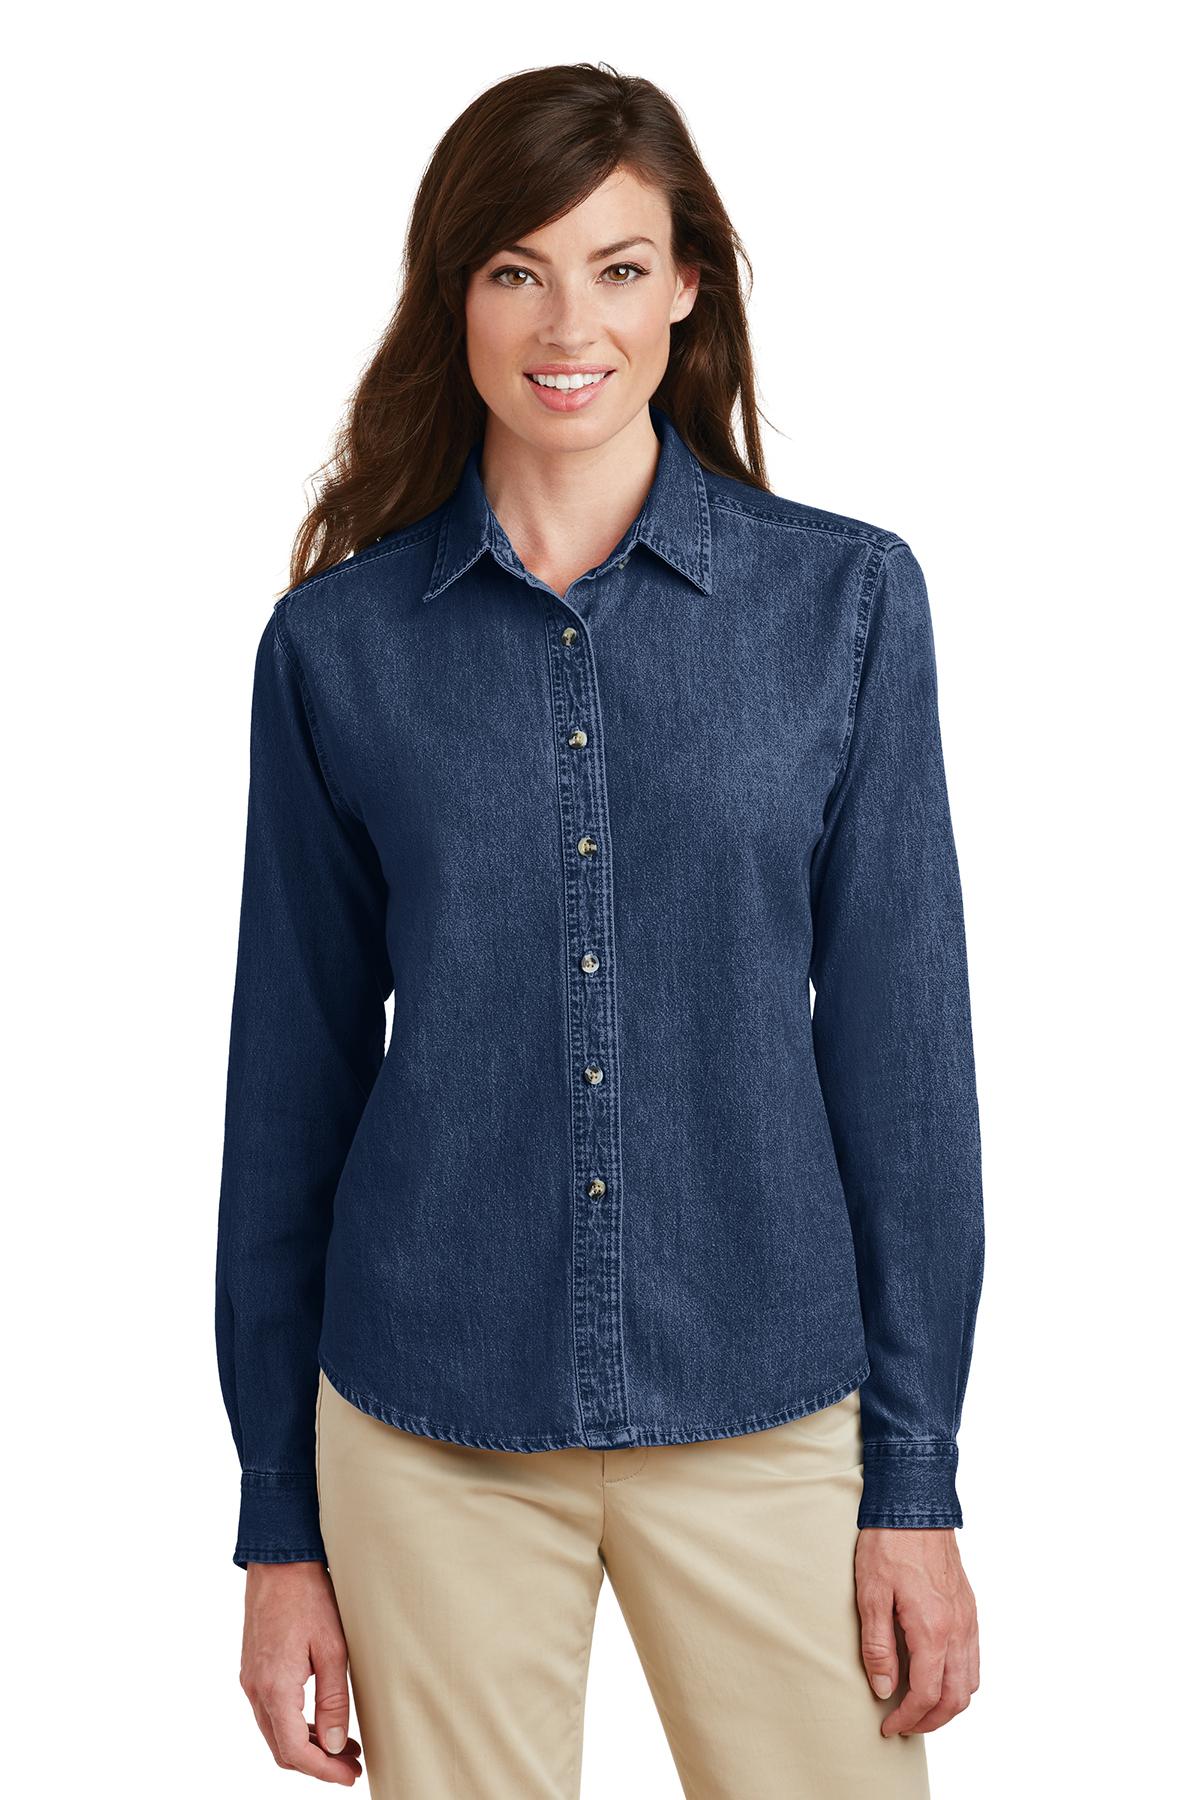 Port /& Company Mens Short Sleeve Value Denim Shirt